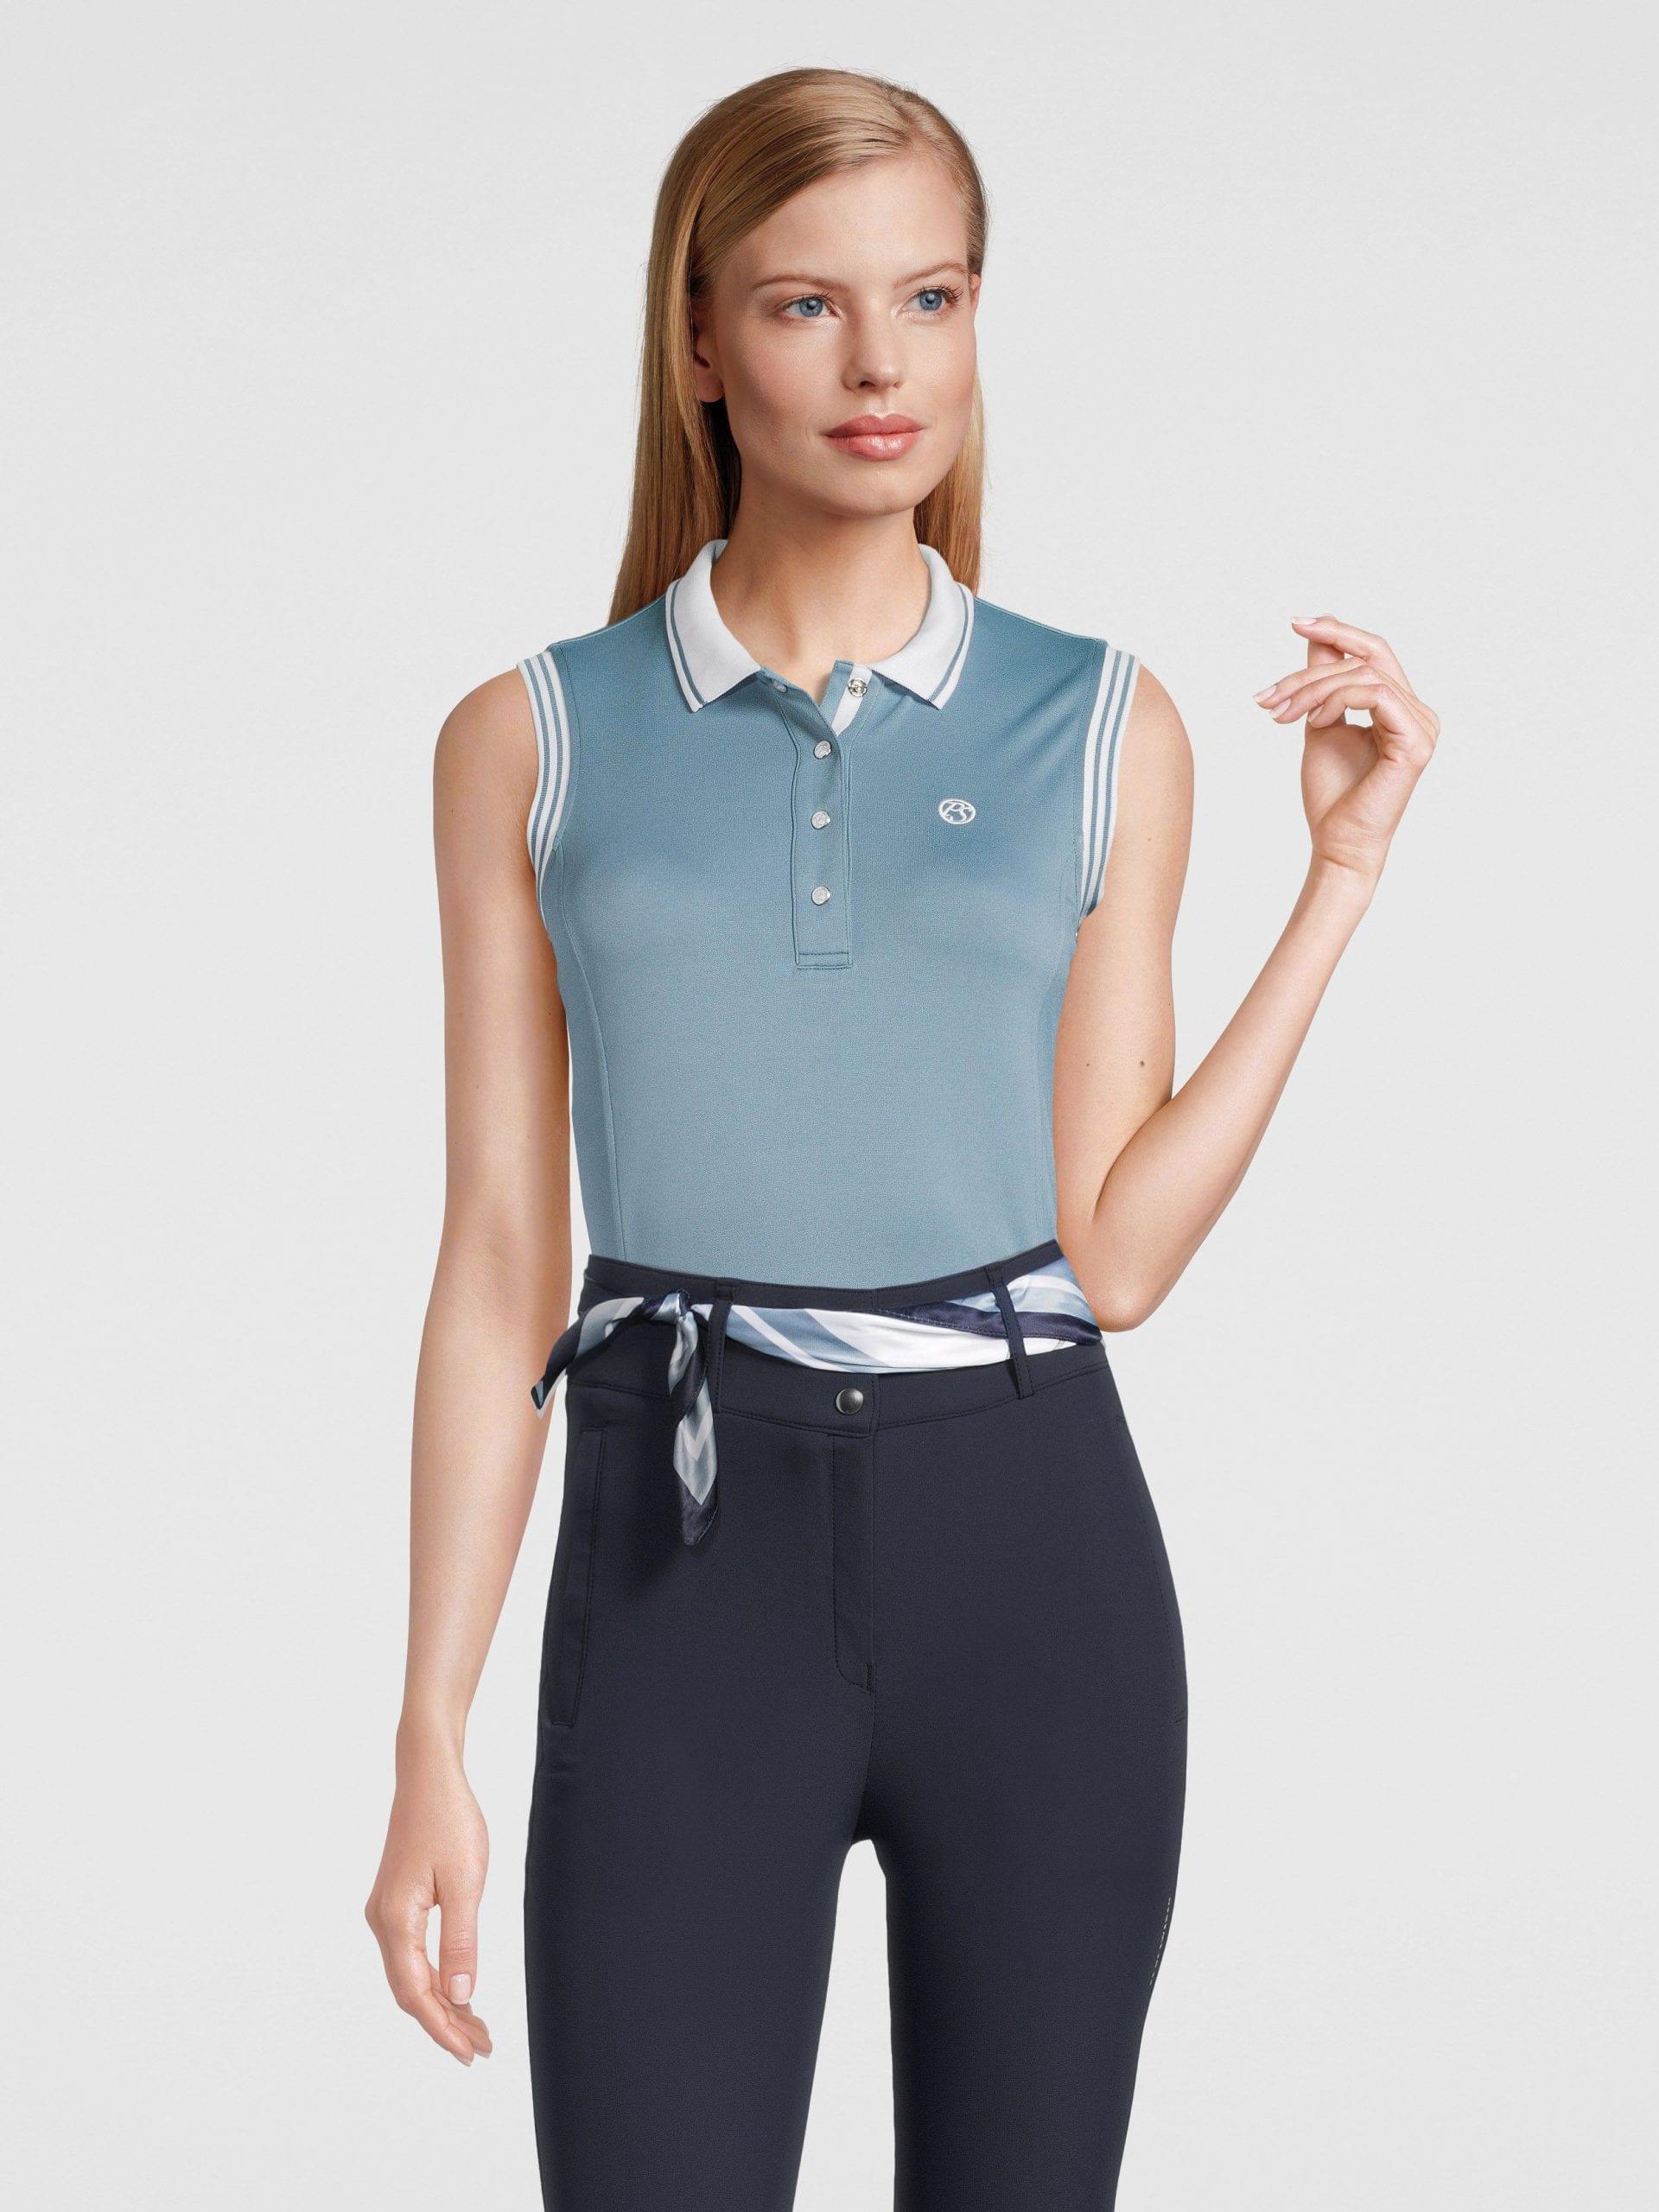 polo shirt sleeveless aqua